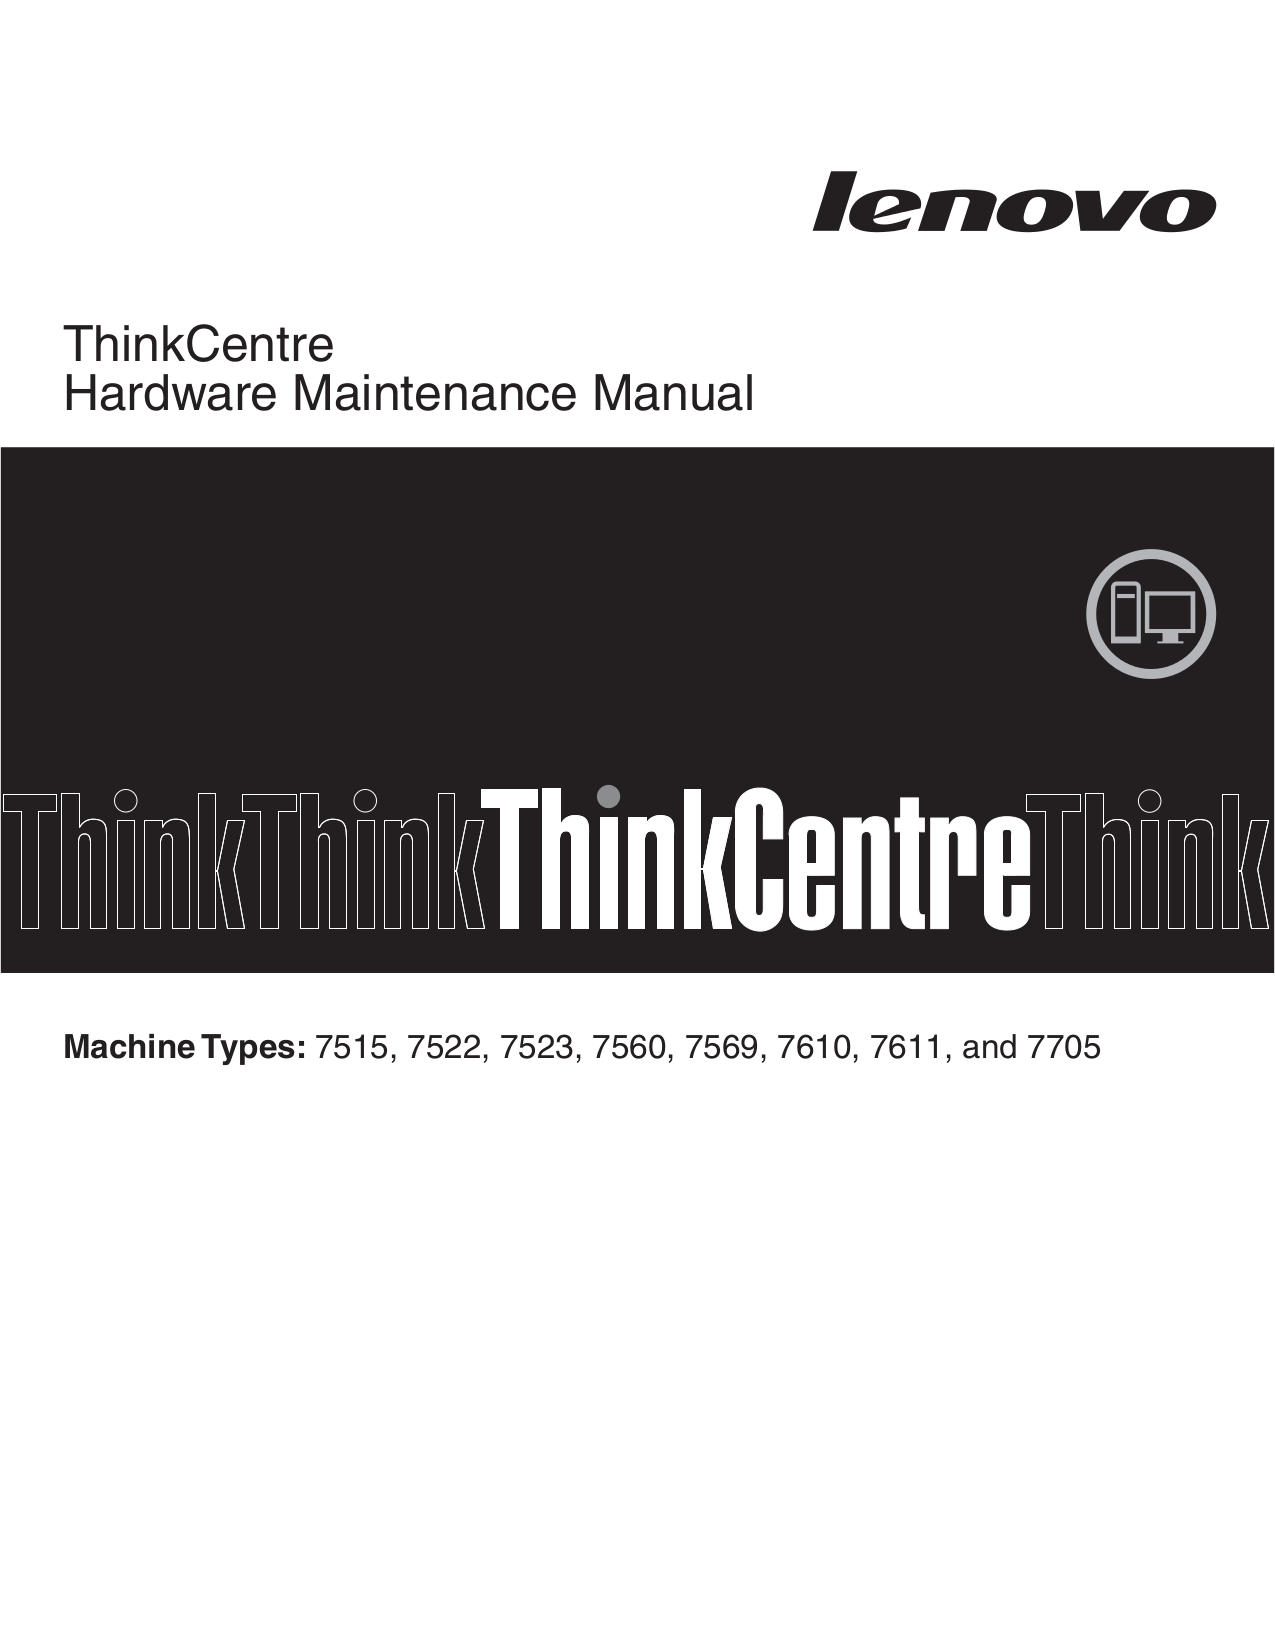 pdf for Lenovo Desktop ThinkCentre A58 7560 manual